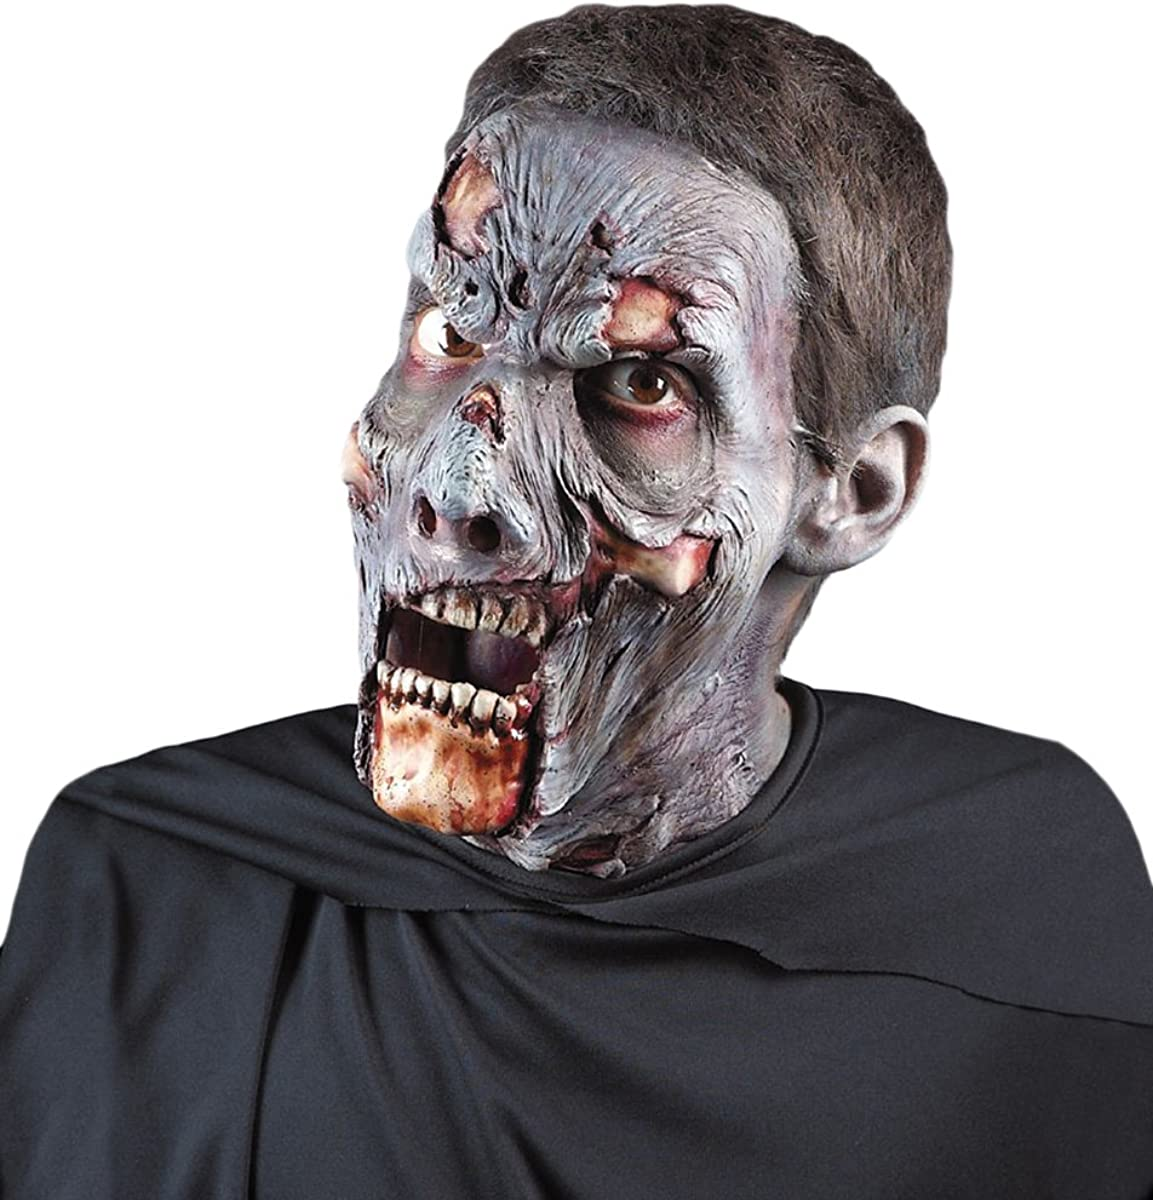 Zombie Mask Kit